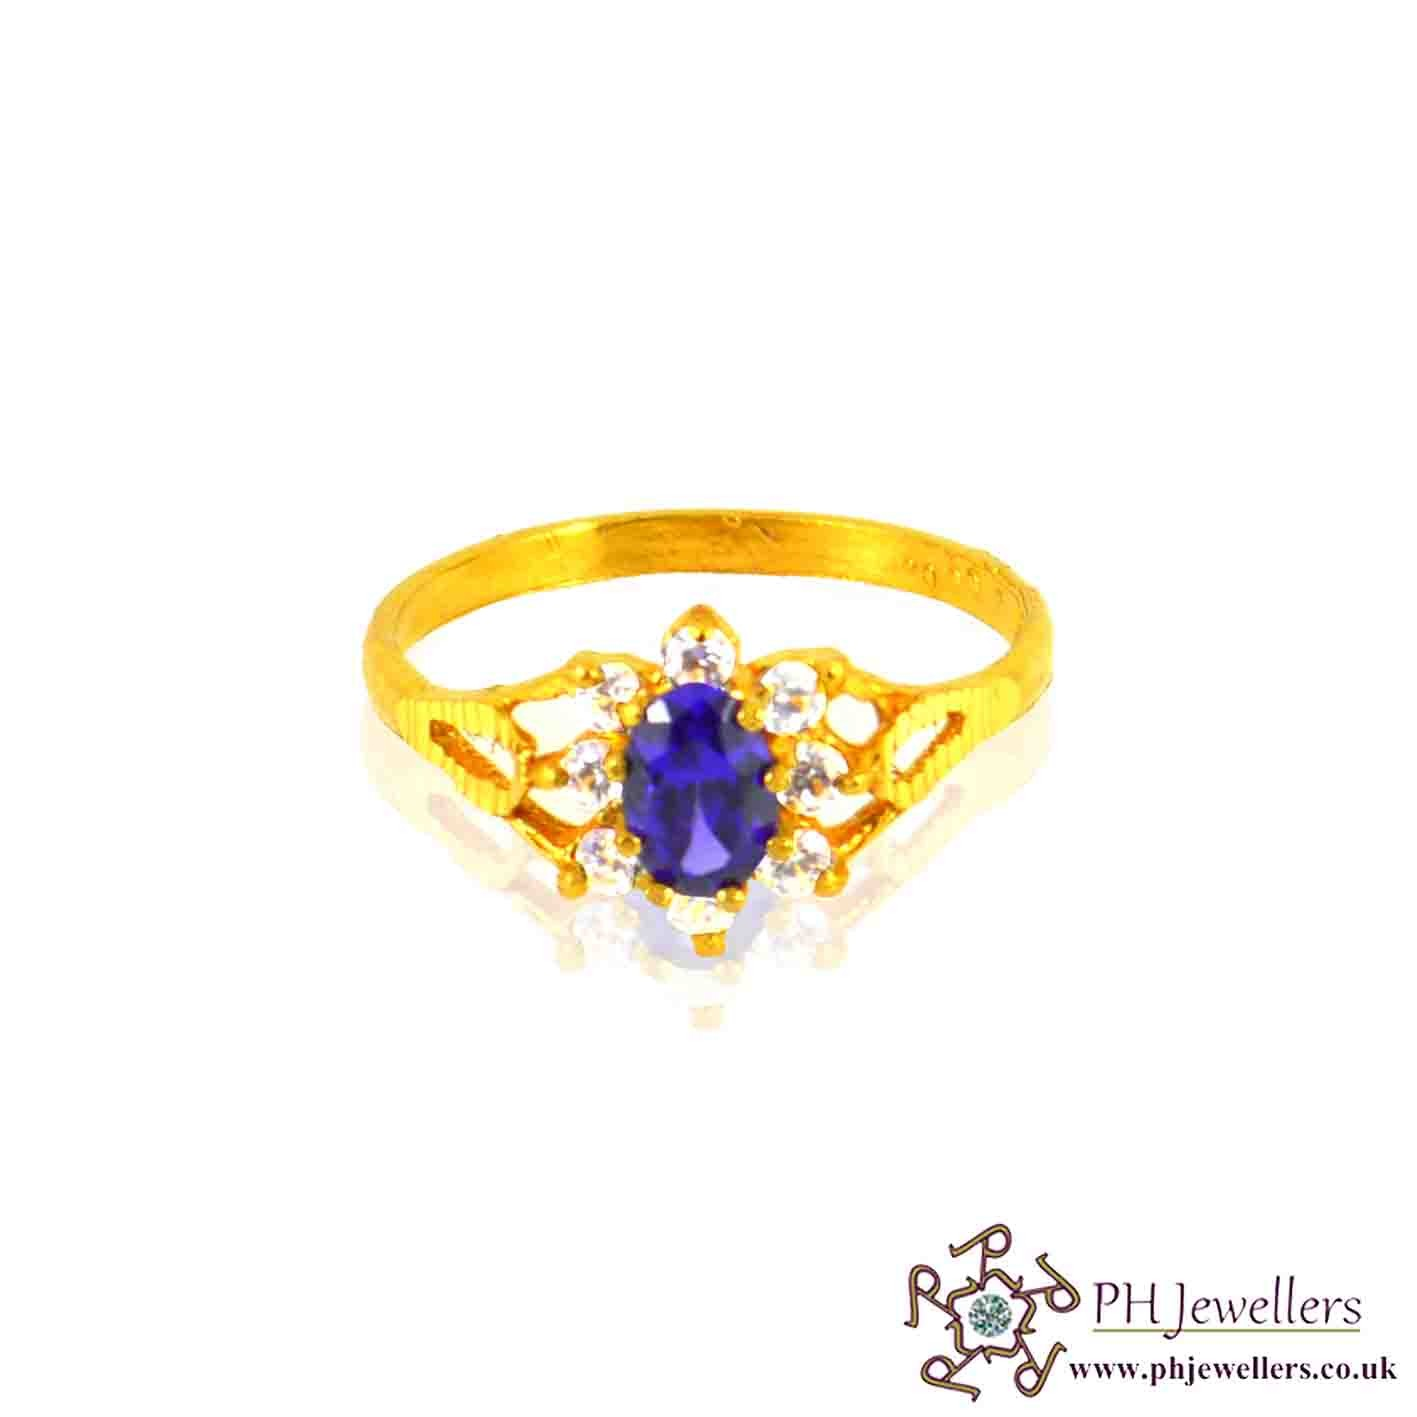 22ct 916 Hallmark Yellow Gold Cluster Oval Amethist Size L1/2,M Ring CZ SR30